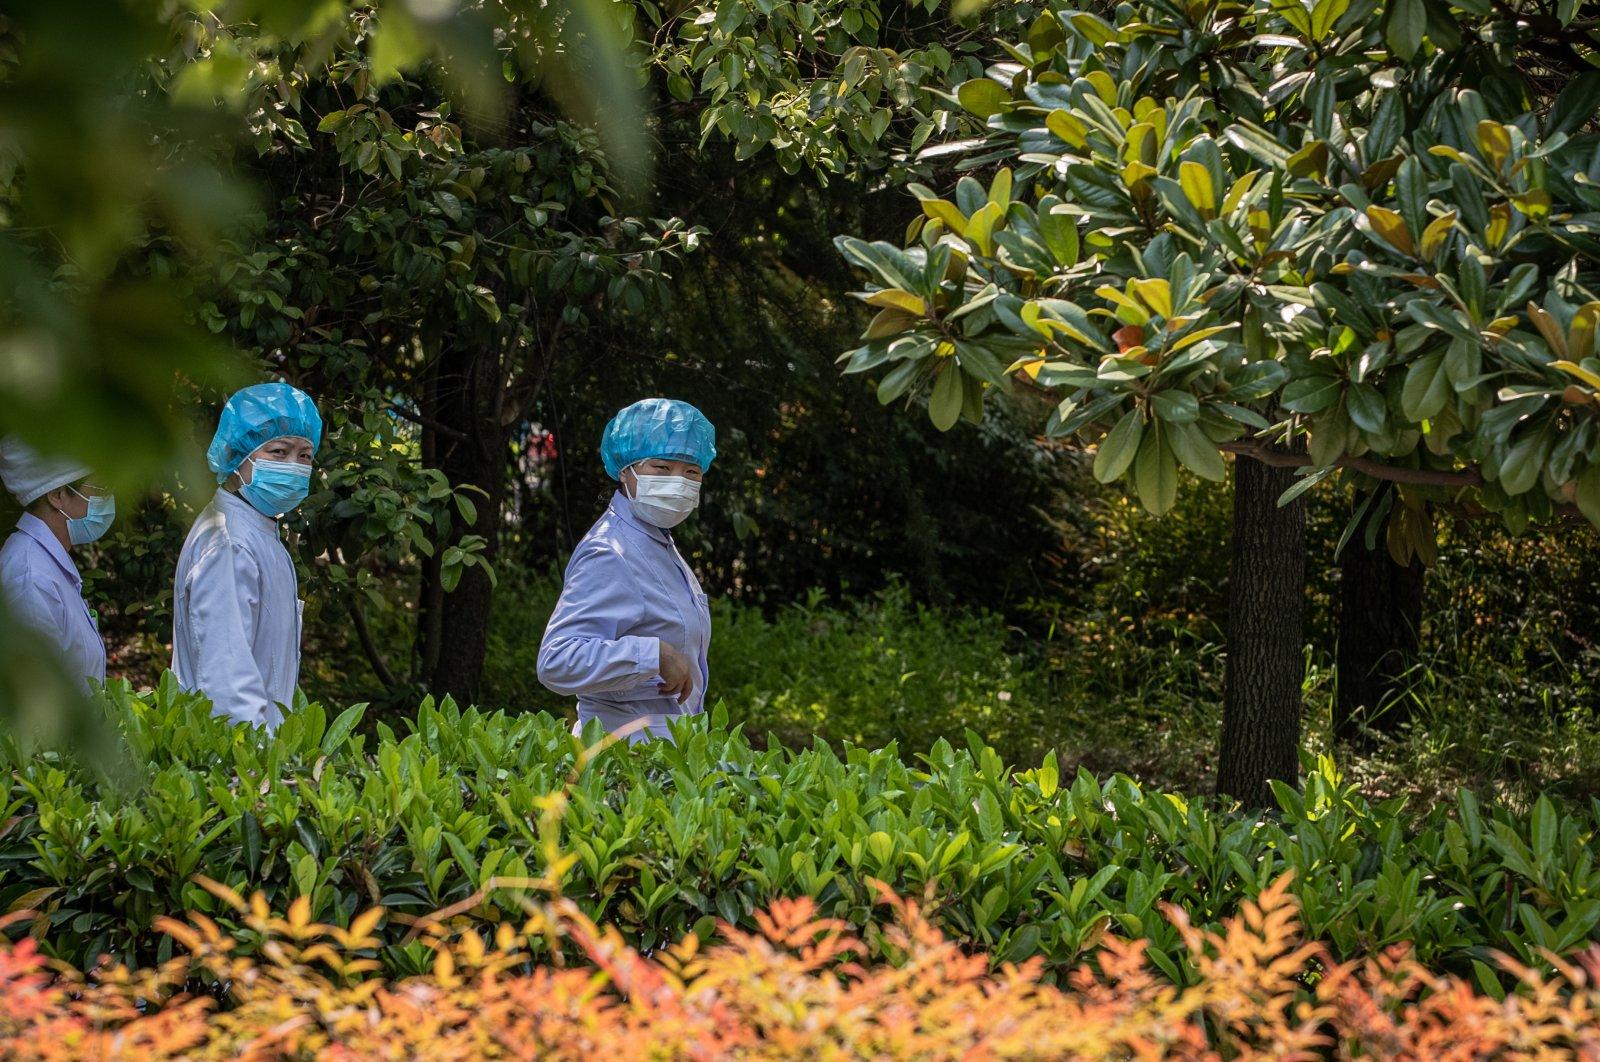 Medical workers walk outside Jinyintan Hospital, in Wuhan, China, April 9, 2020. (EPA Photo)